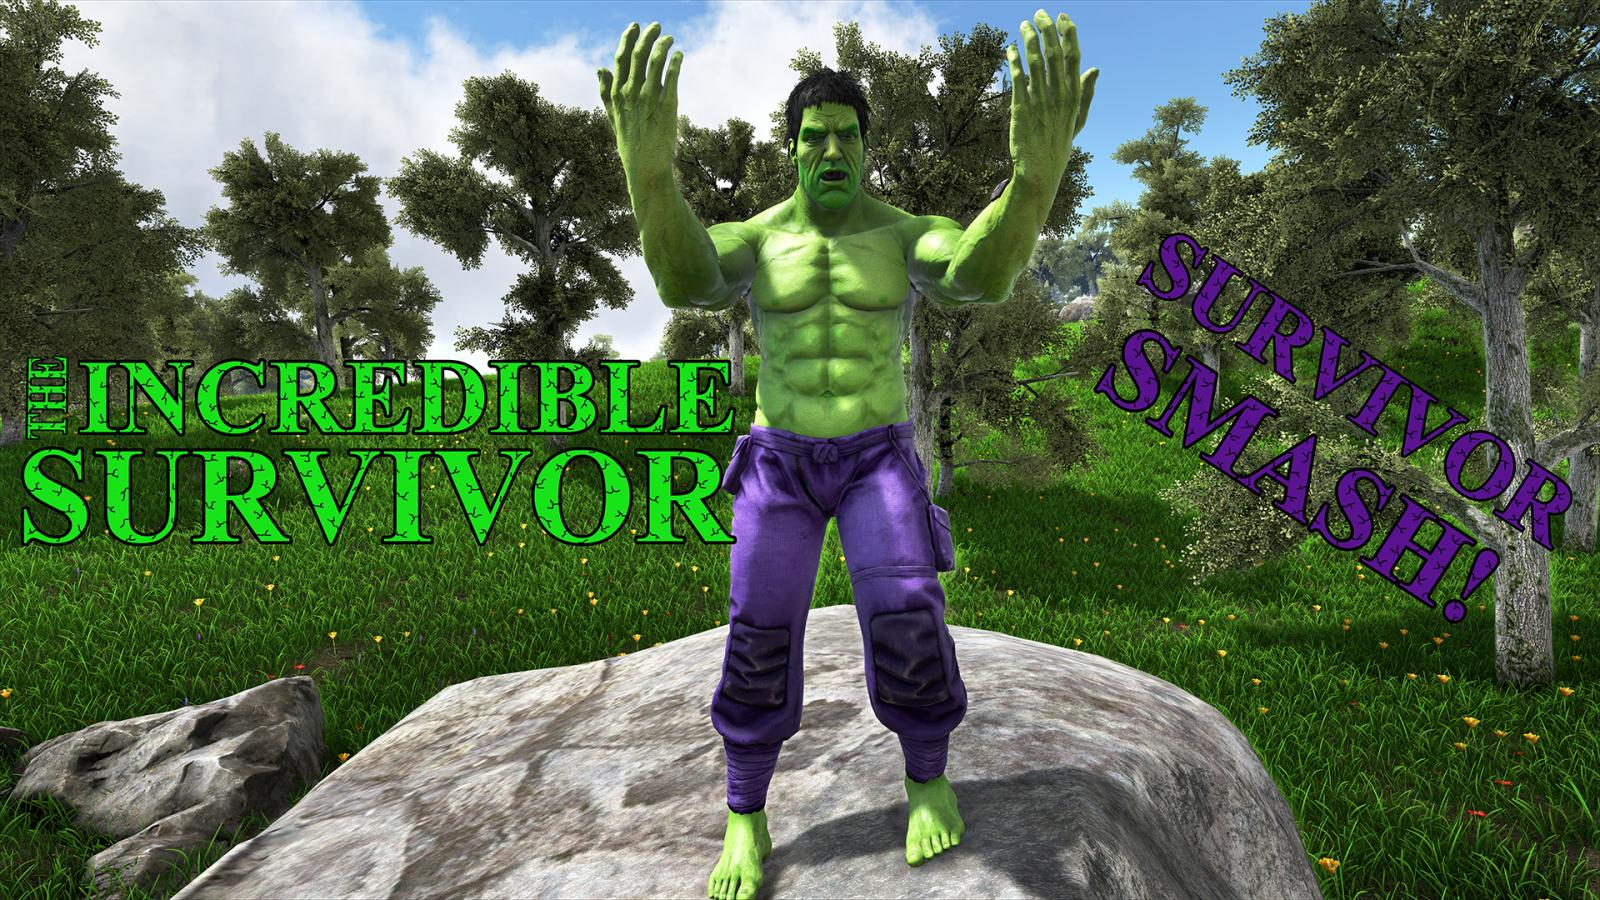 large.5903f5580c8dd_WolfAngelus-TheIncredibleSurvivor(HulkParody)-Freeform.jpg